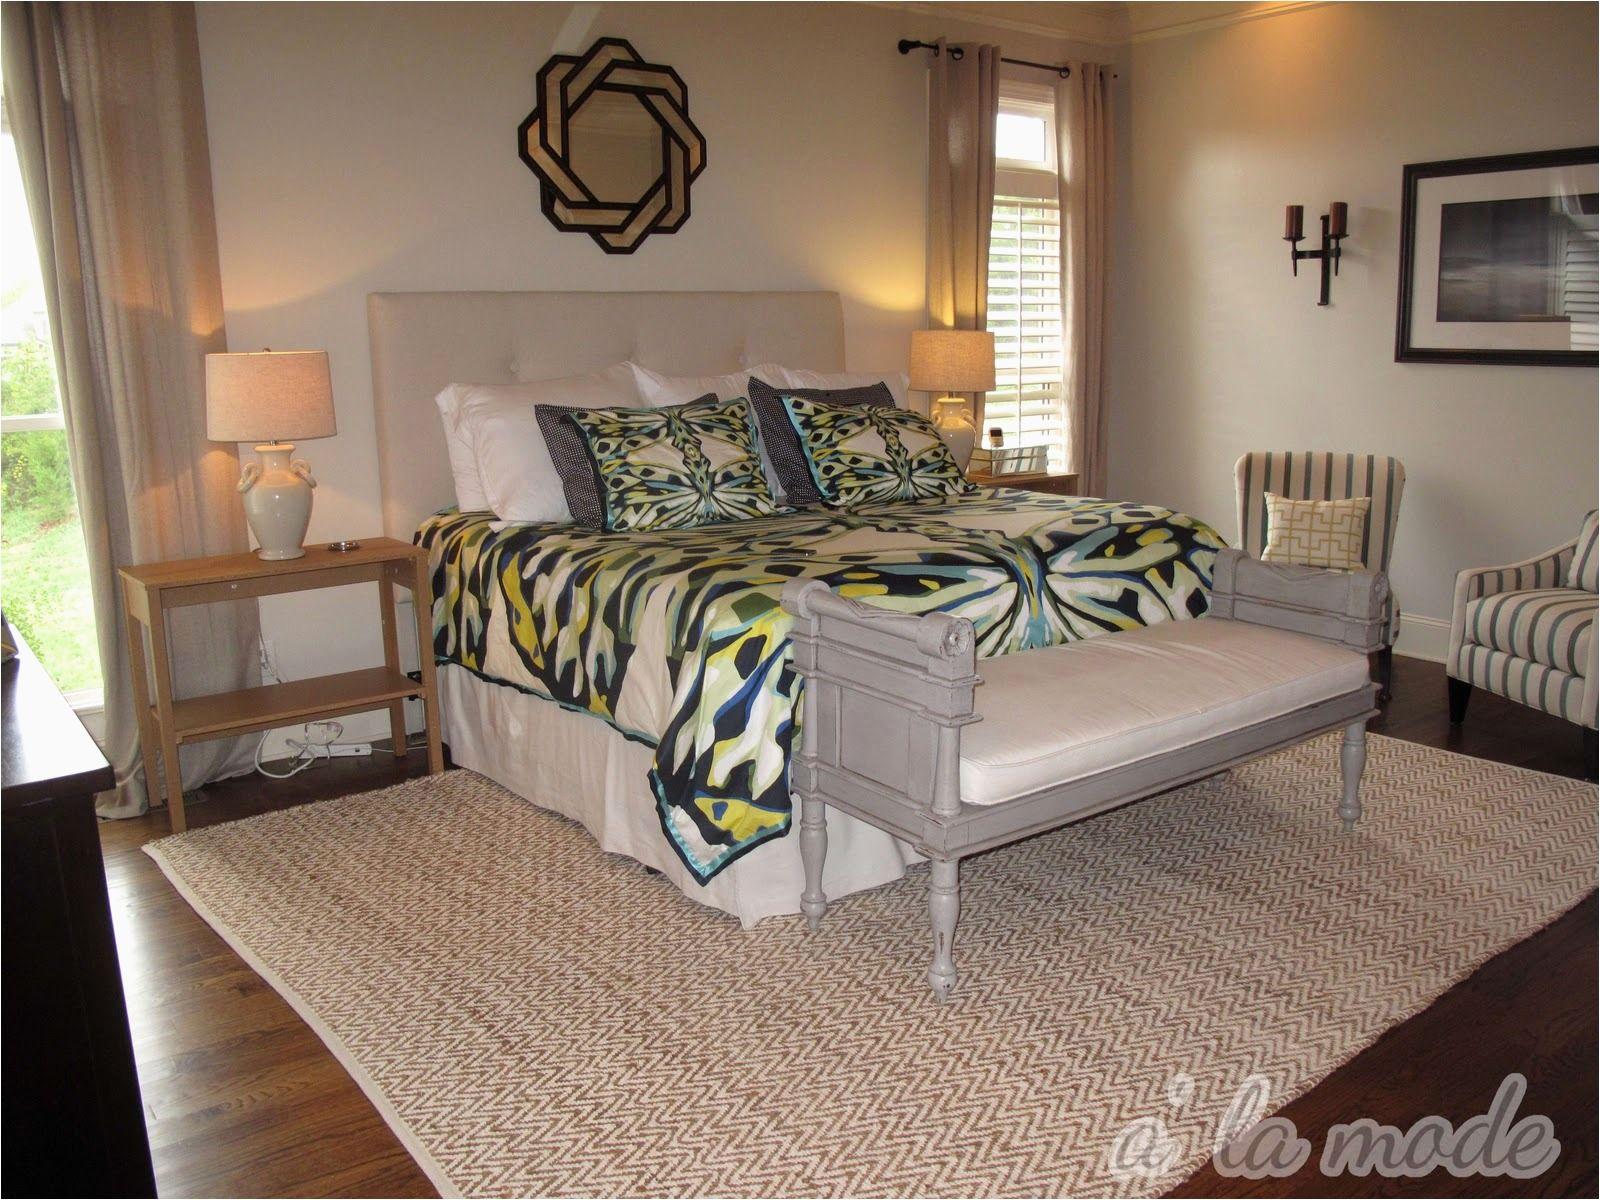 Dream Guest Room Inspo May, 2018 Bedroom carpet colors